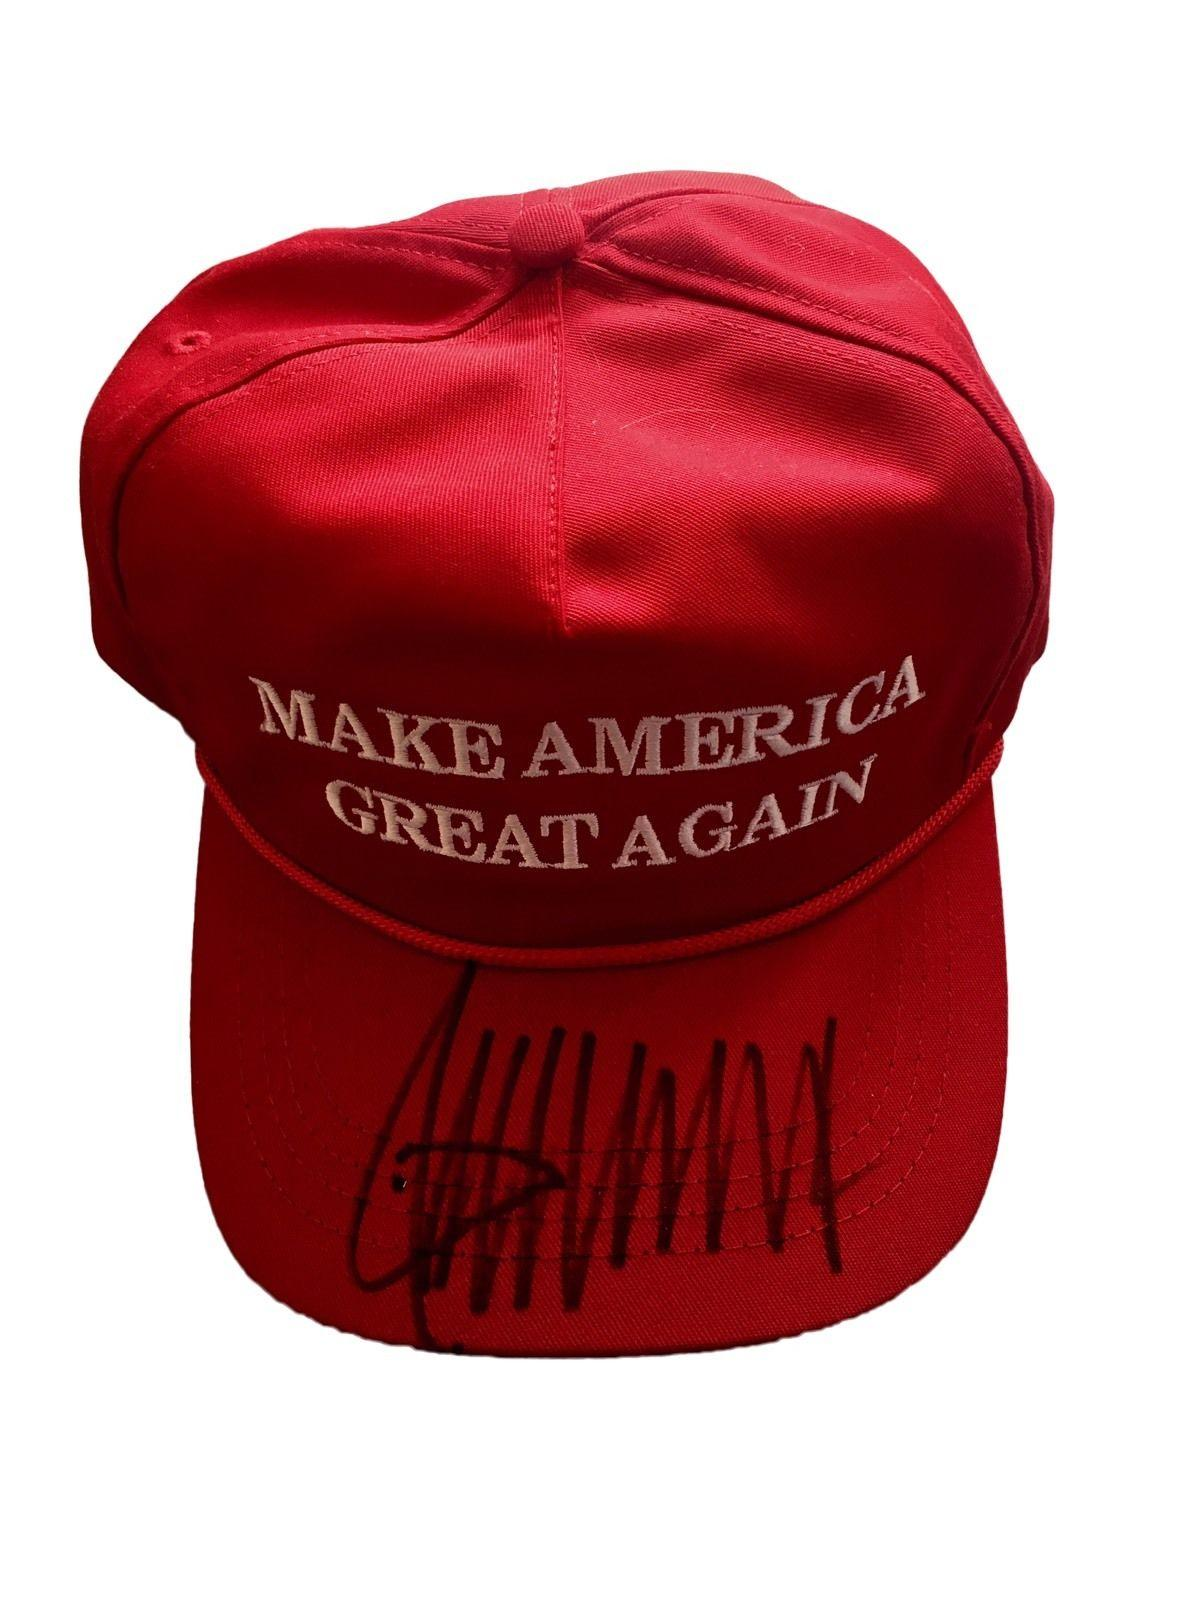 Make Metallica Great Again Hat : donald trump make america great again signed official hat jsa ~ Hamham.info Haus und Dekorationen